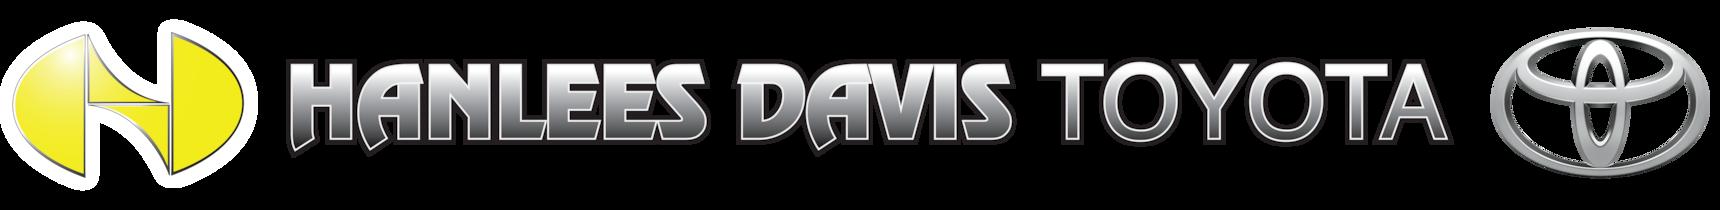 Hanlees Davis Toyota